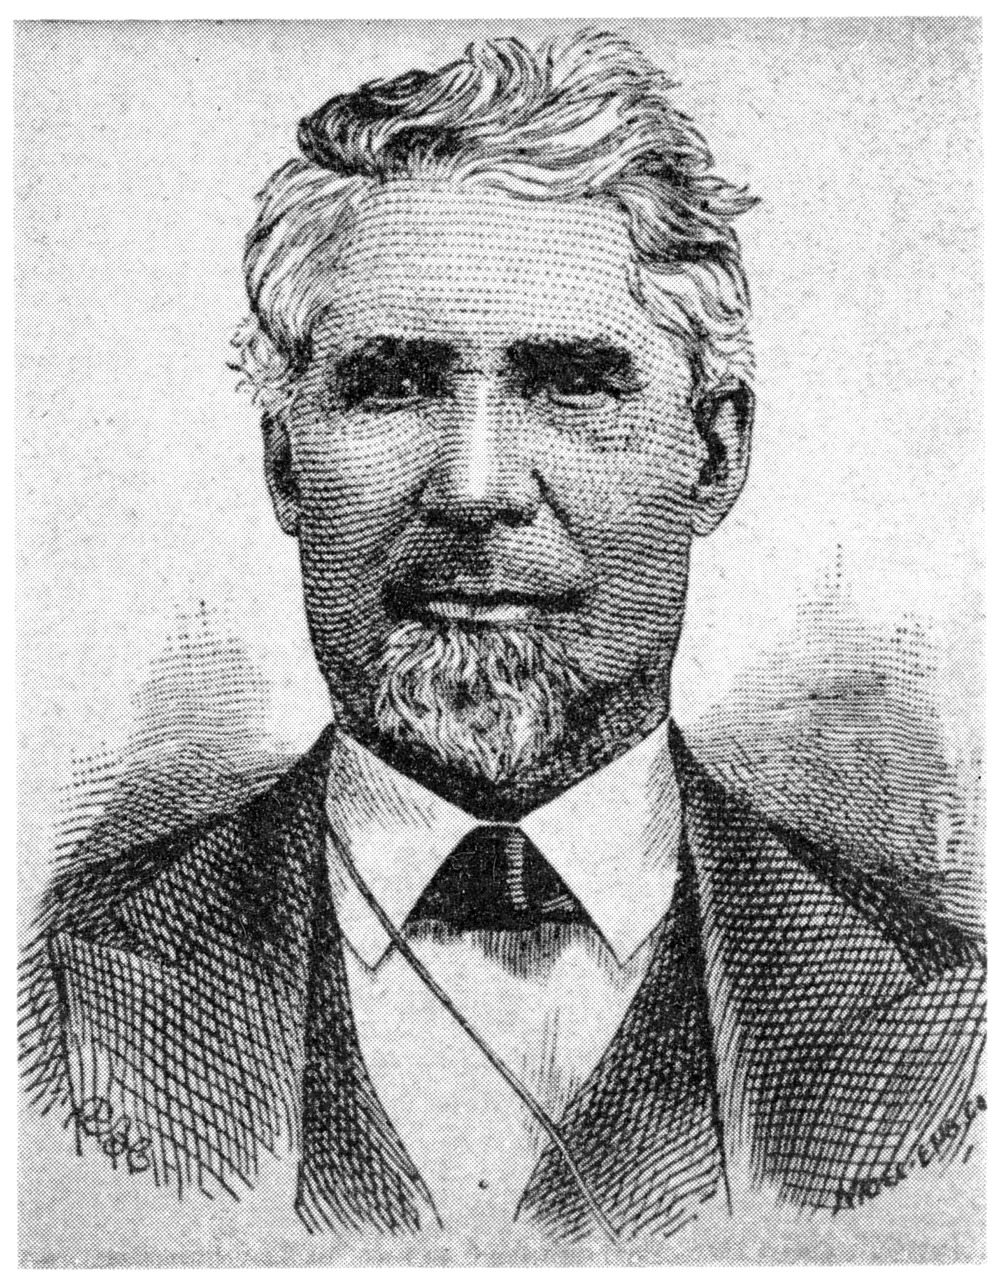 Albert G. Patrick